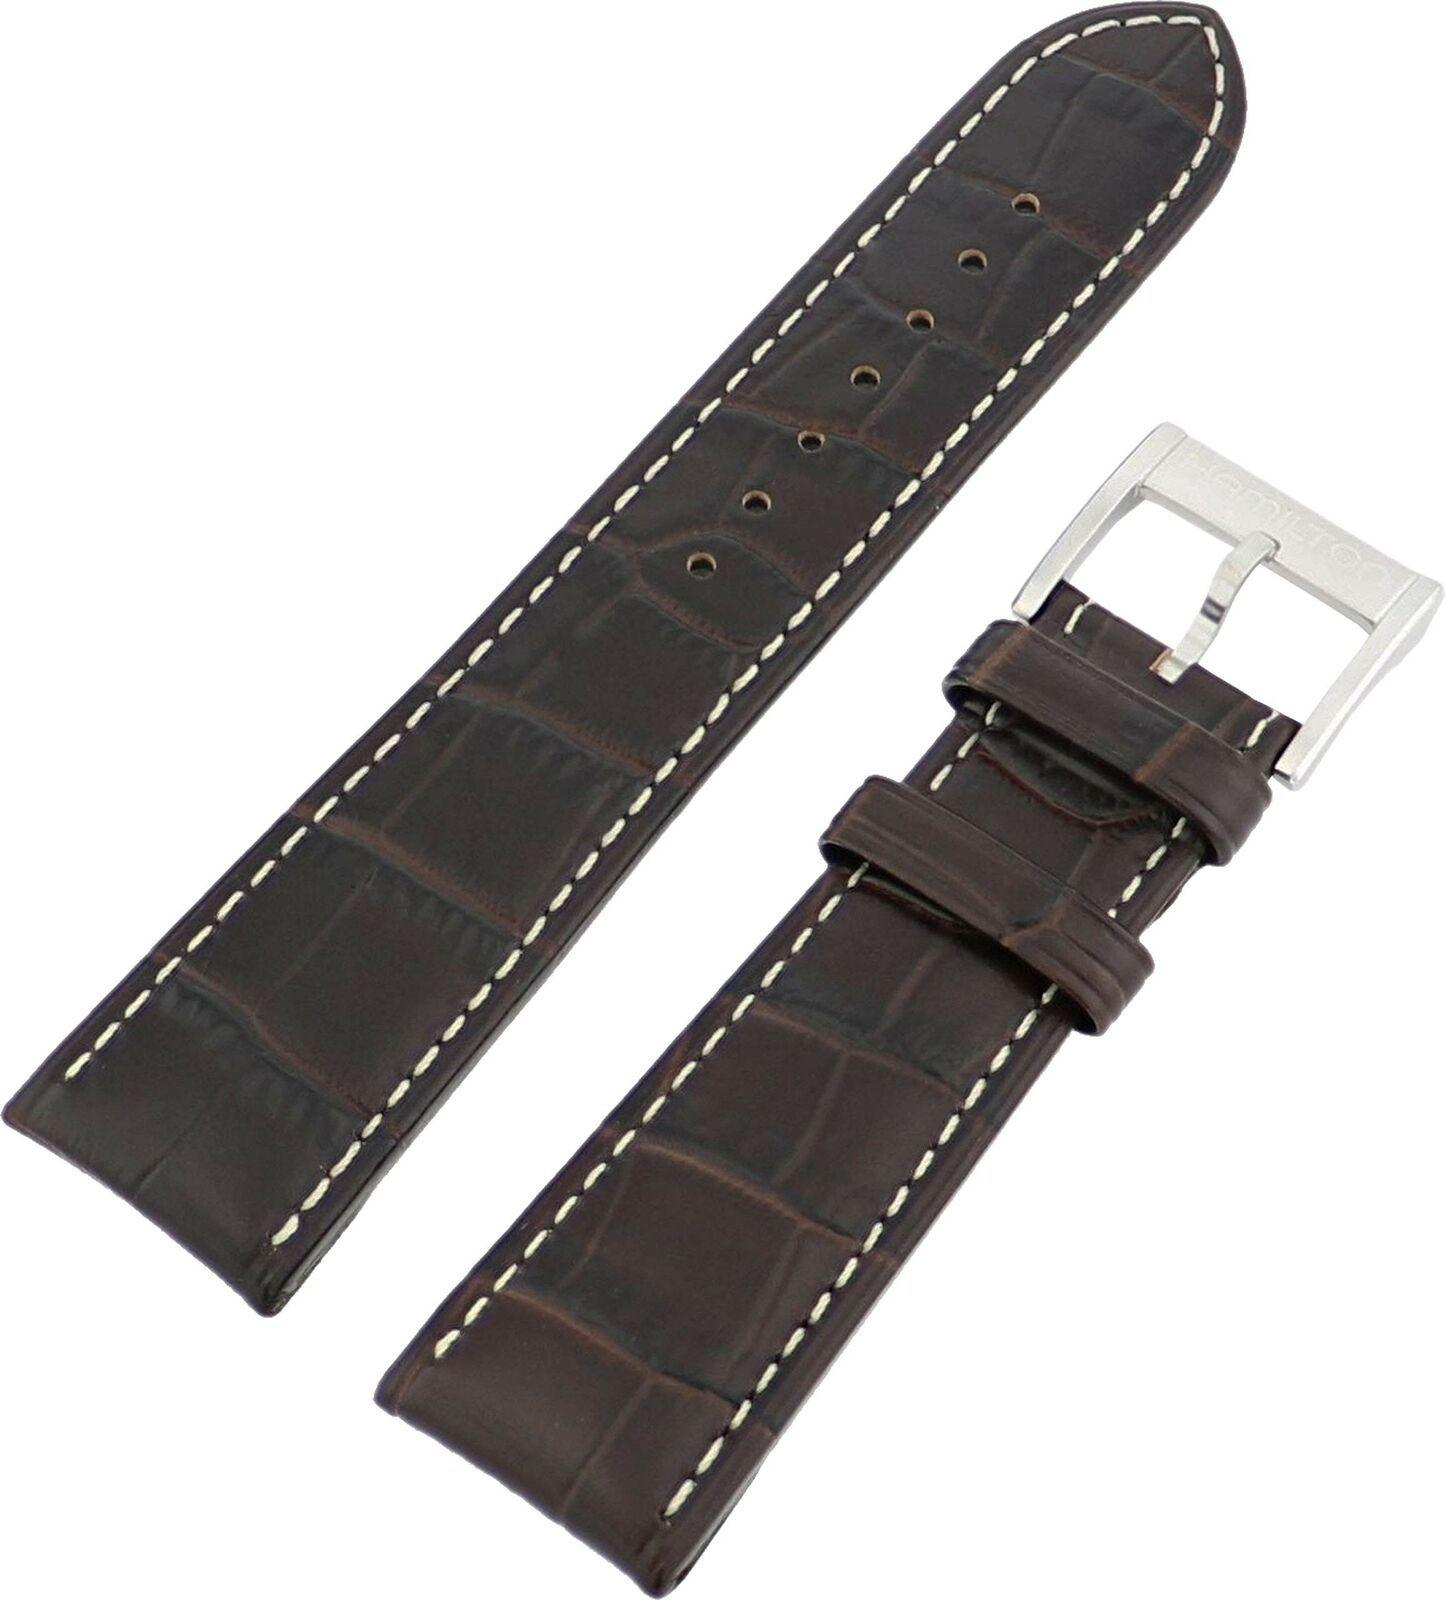 Hamilton 24/22mm Genuine Dark Brown Leather Strap SHIPSFREE - $105.00